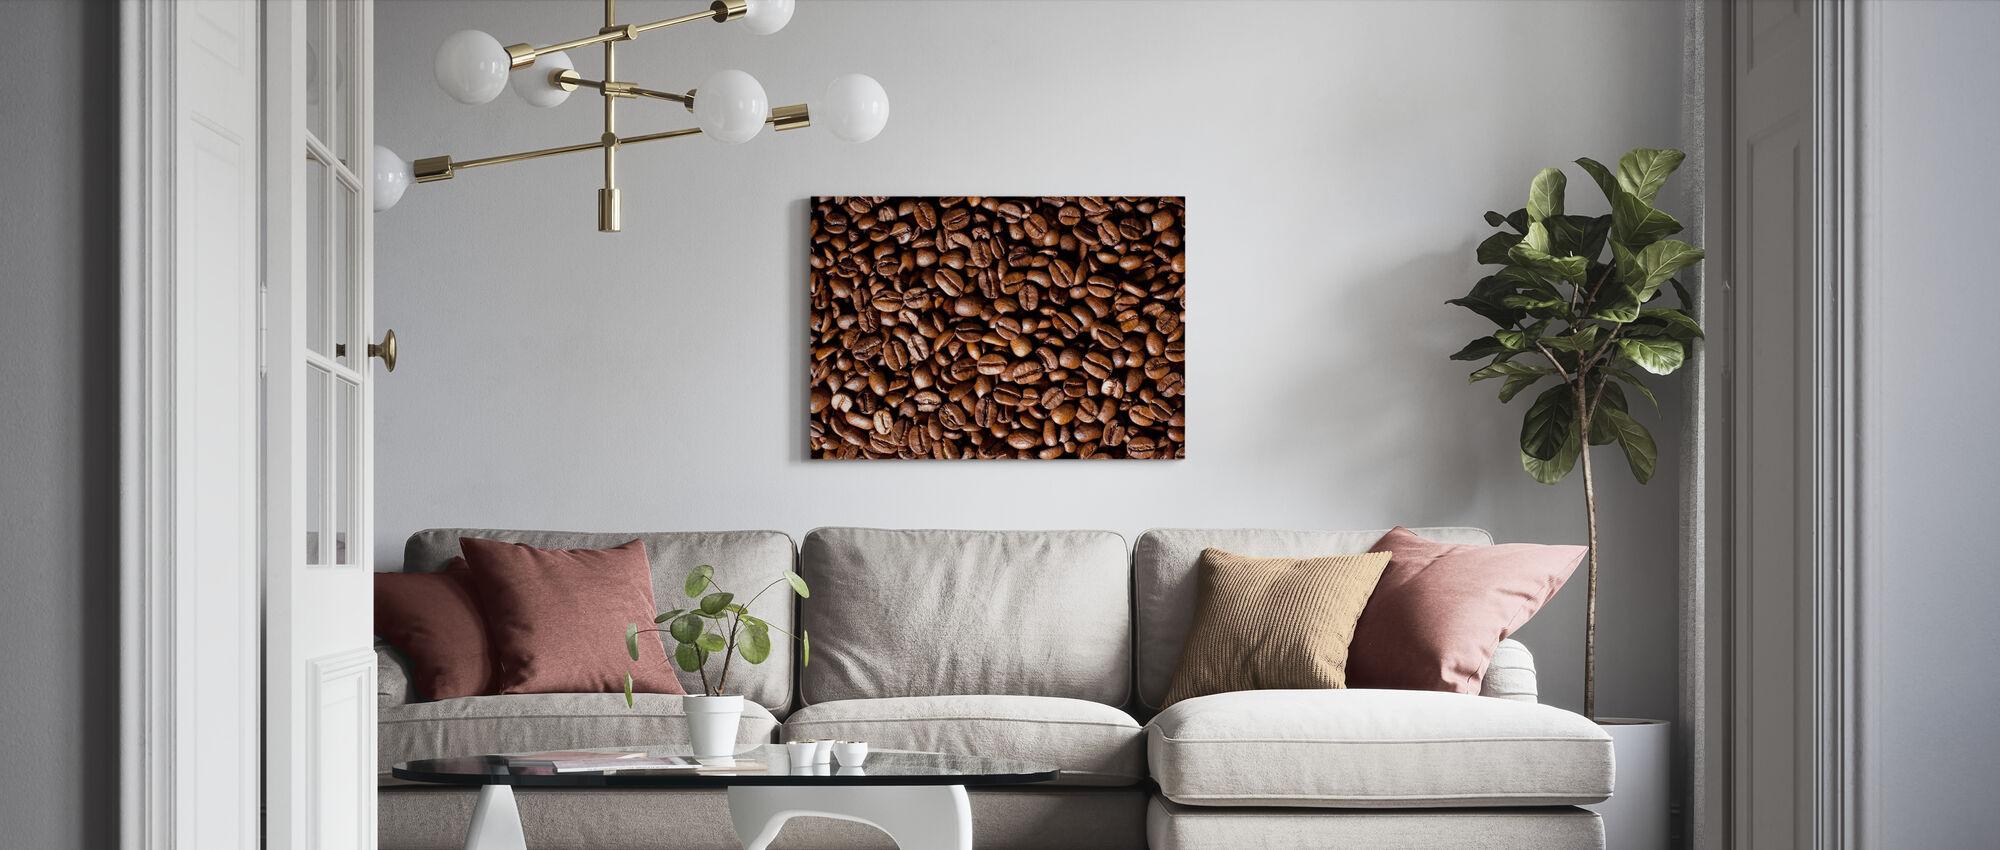 Coffee Beans - Canvas print - Living Room